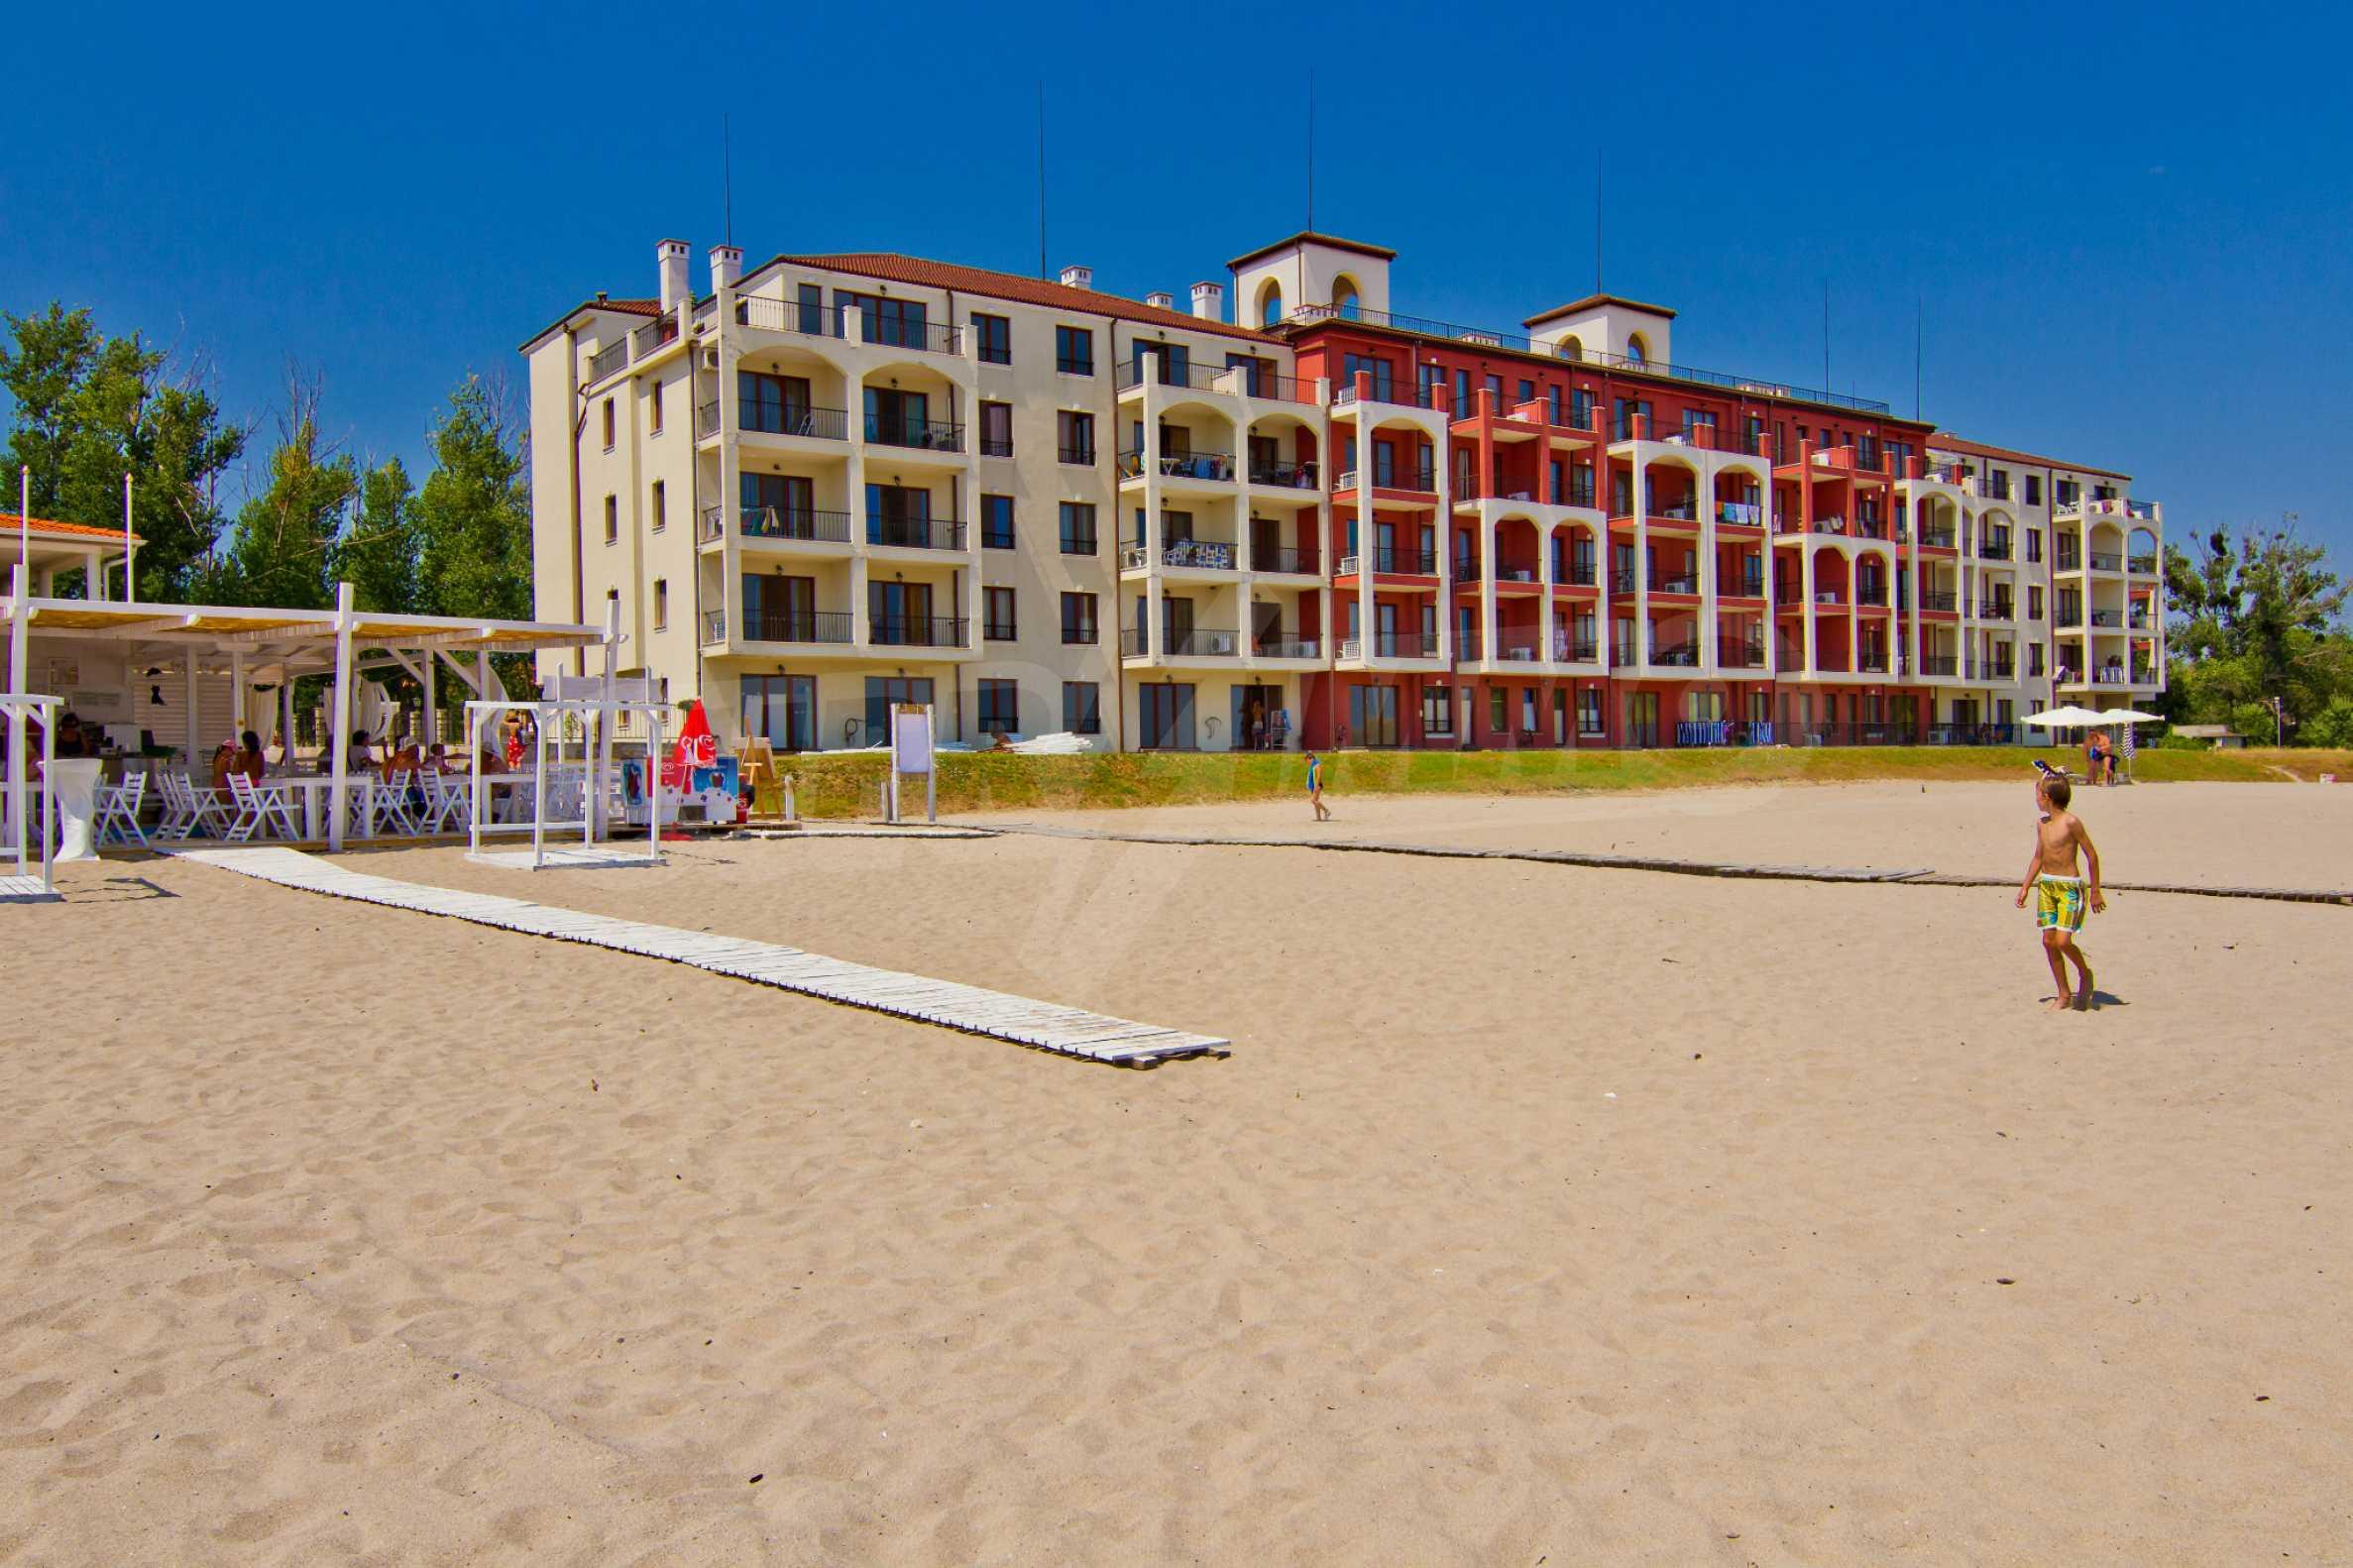 Примеа Бийч Резиденс / Primea Beach Residence 5